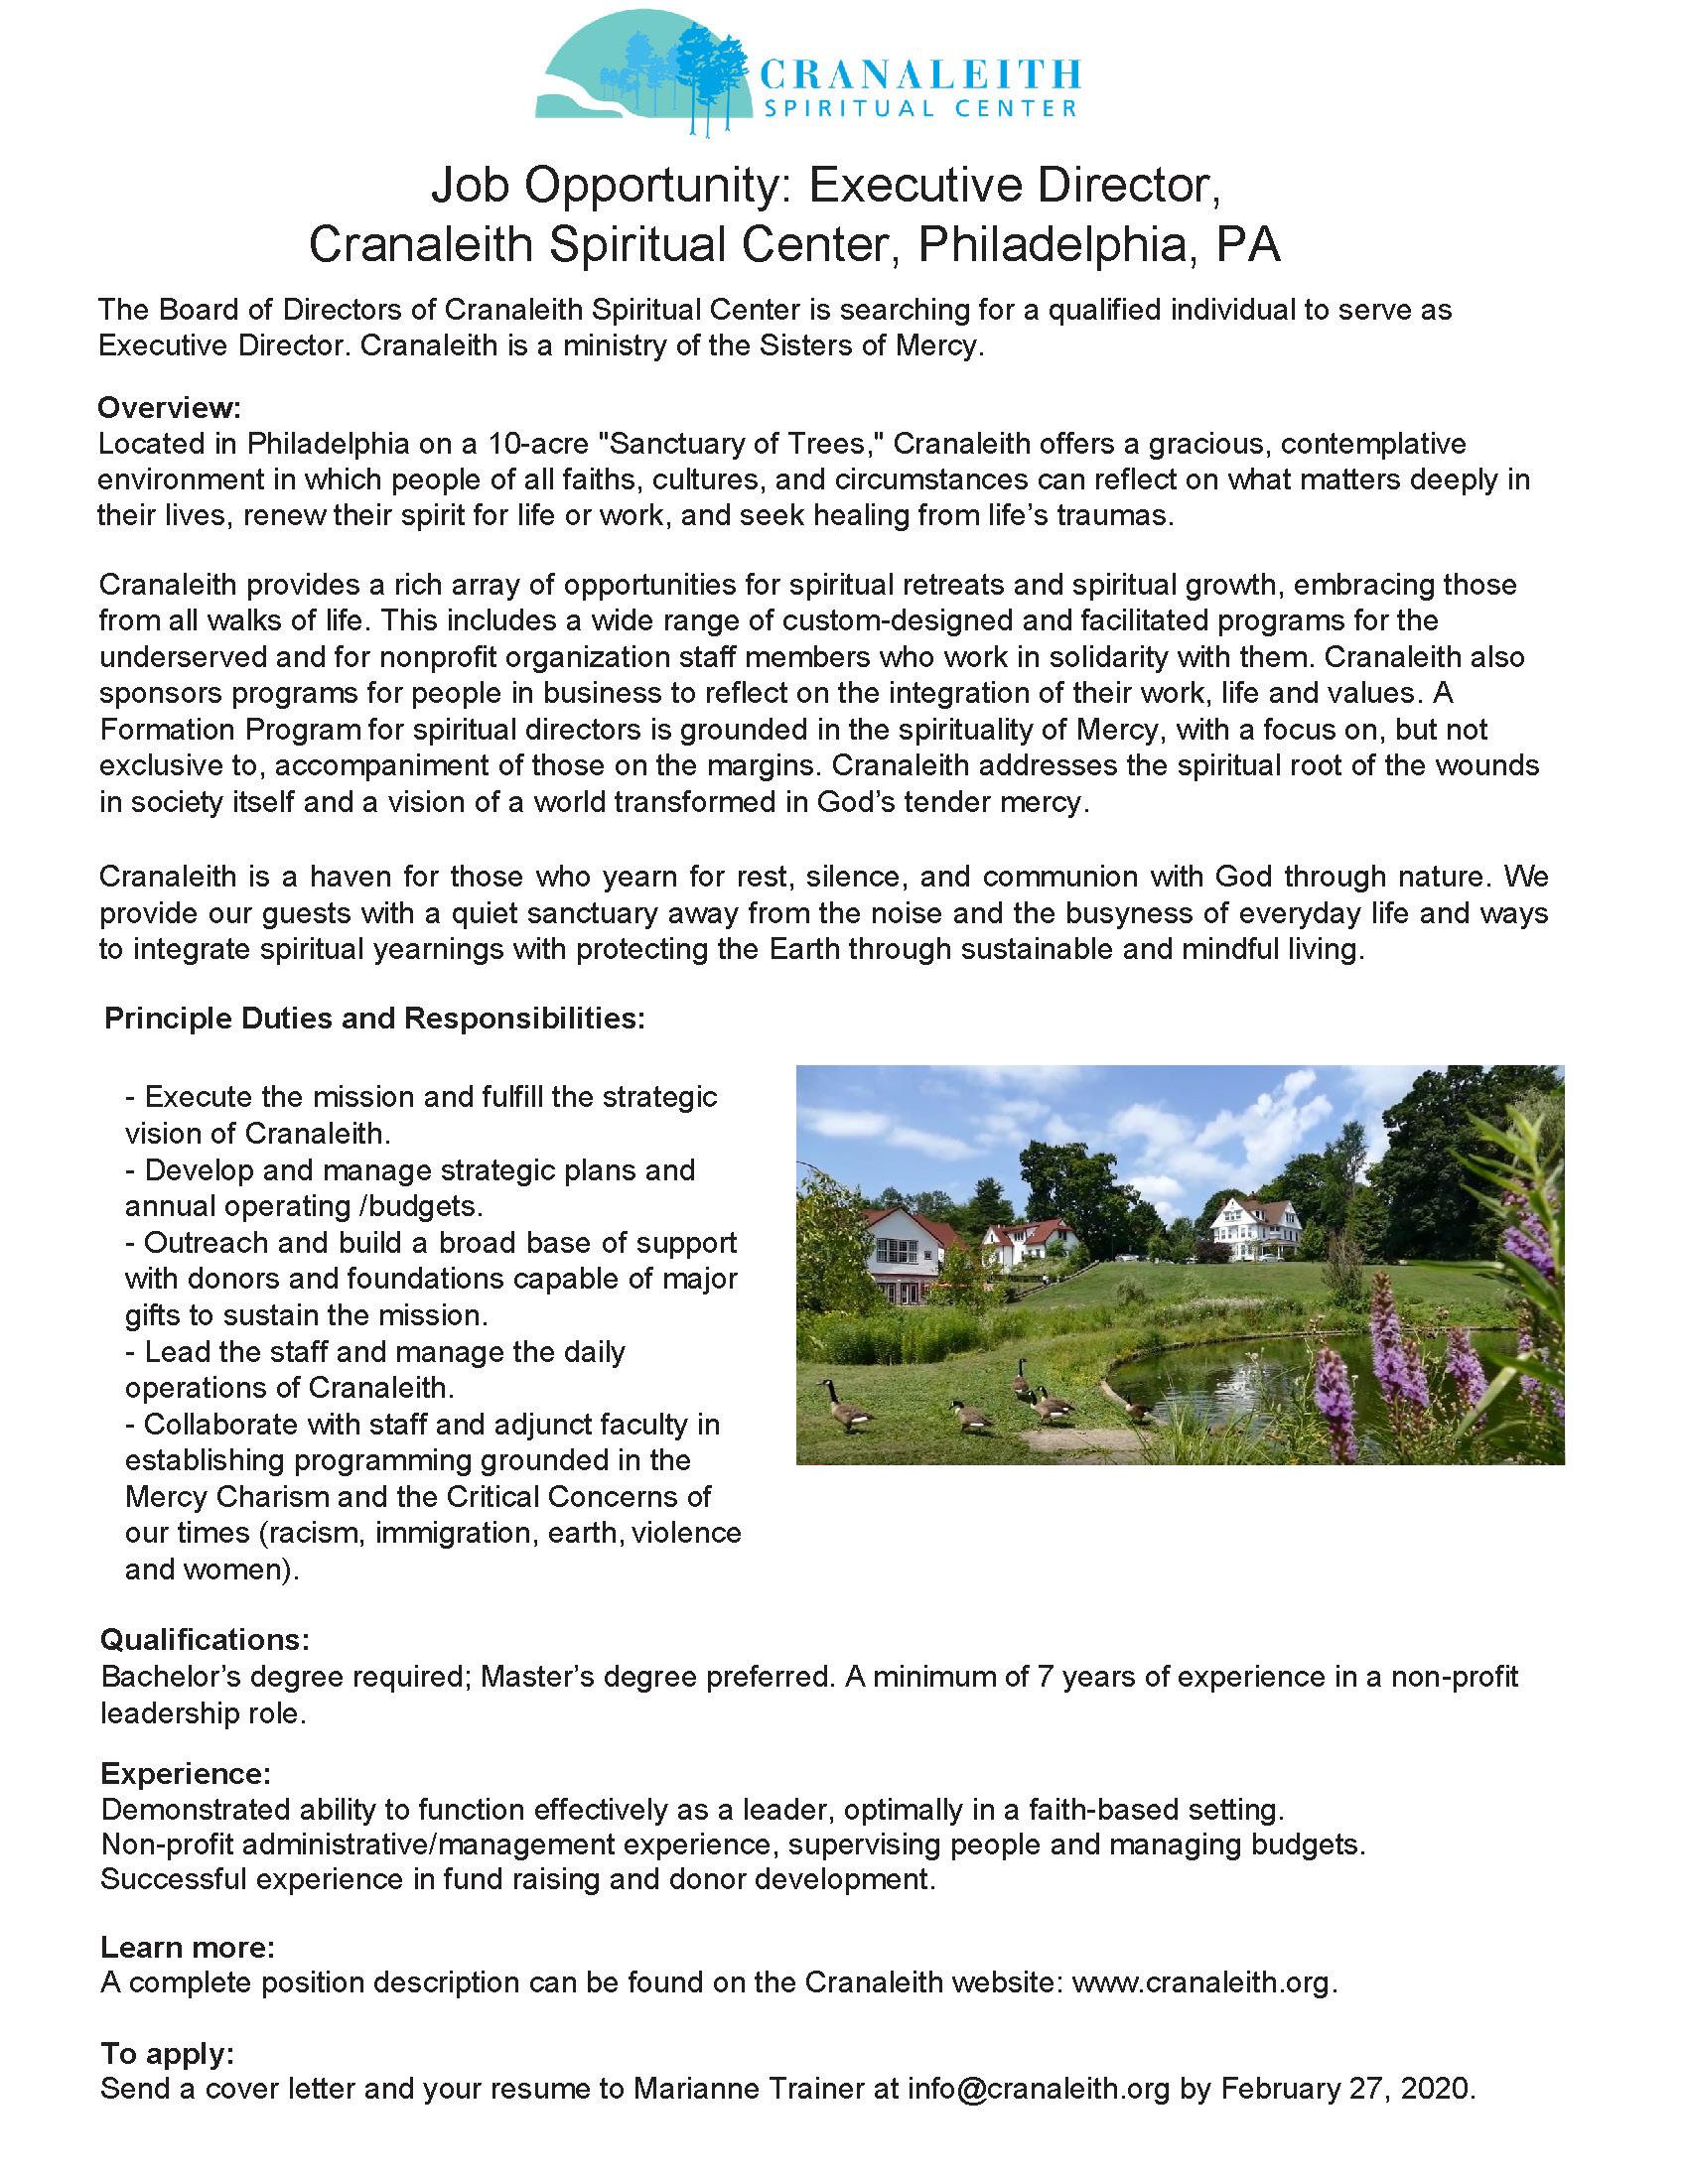 Cranaleith Executive Director - Position Flyer